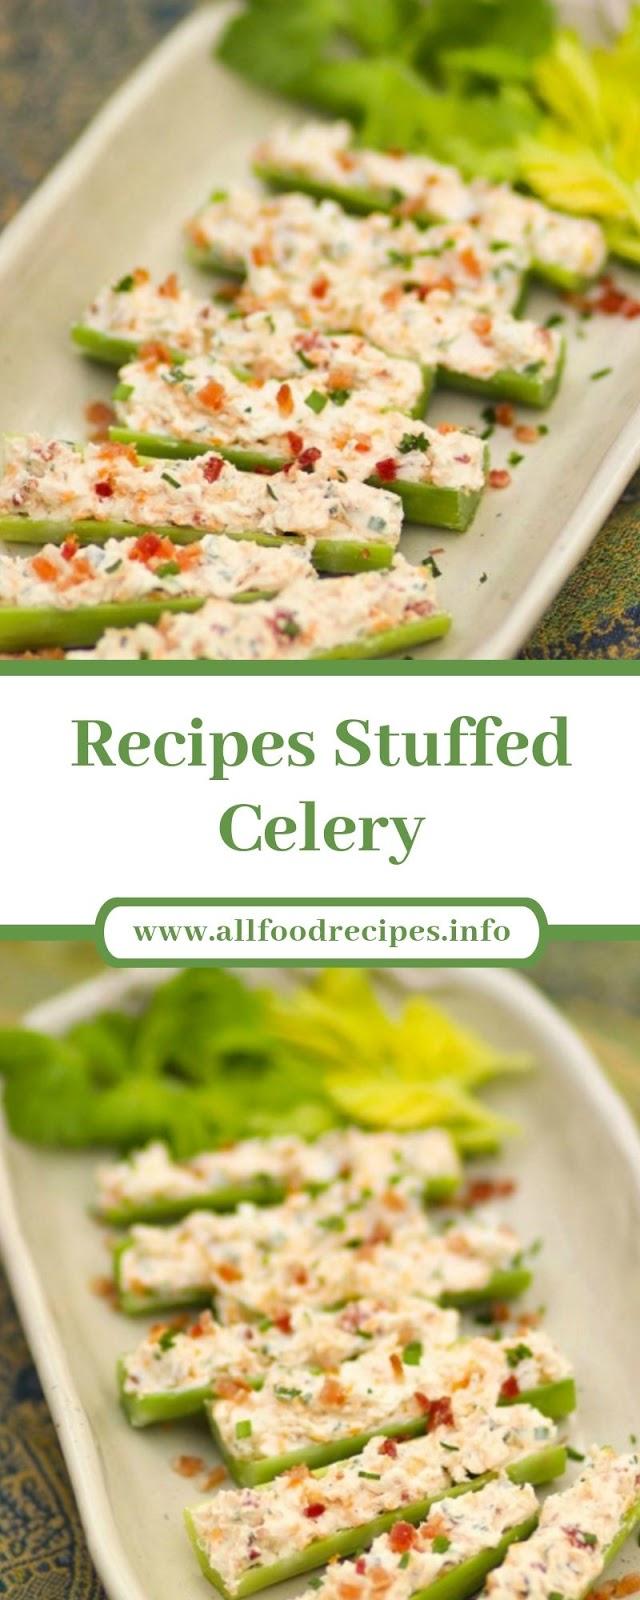 Recipes Stuffed Celery